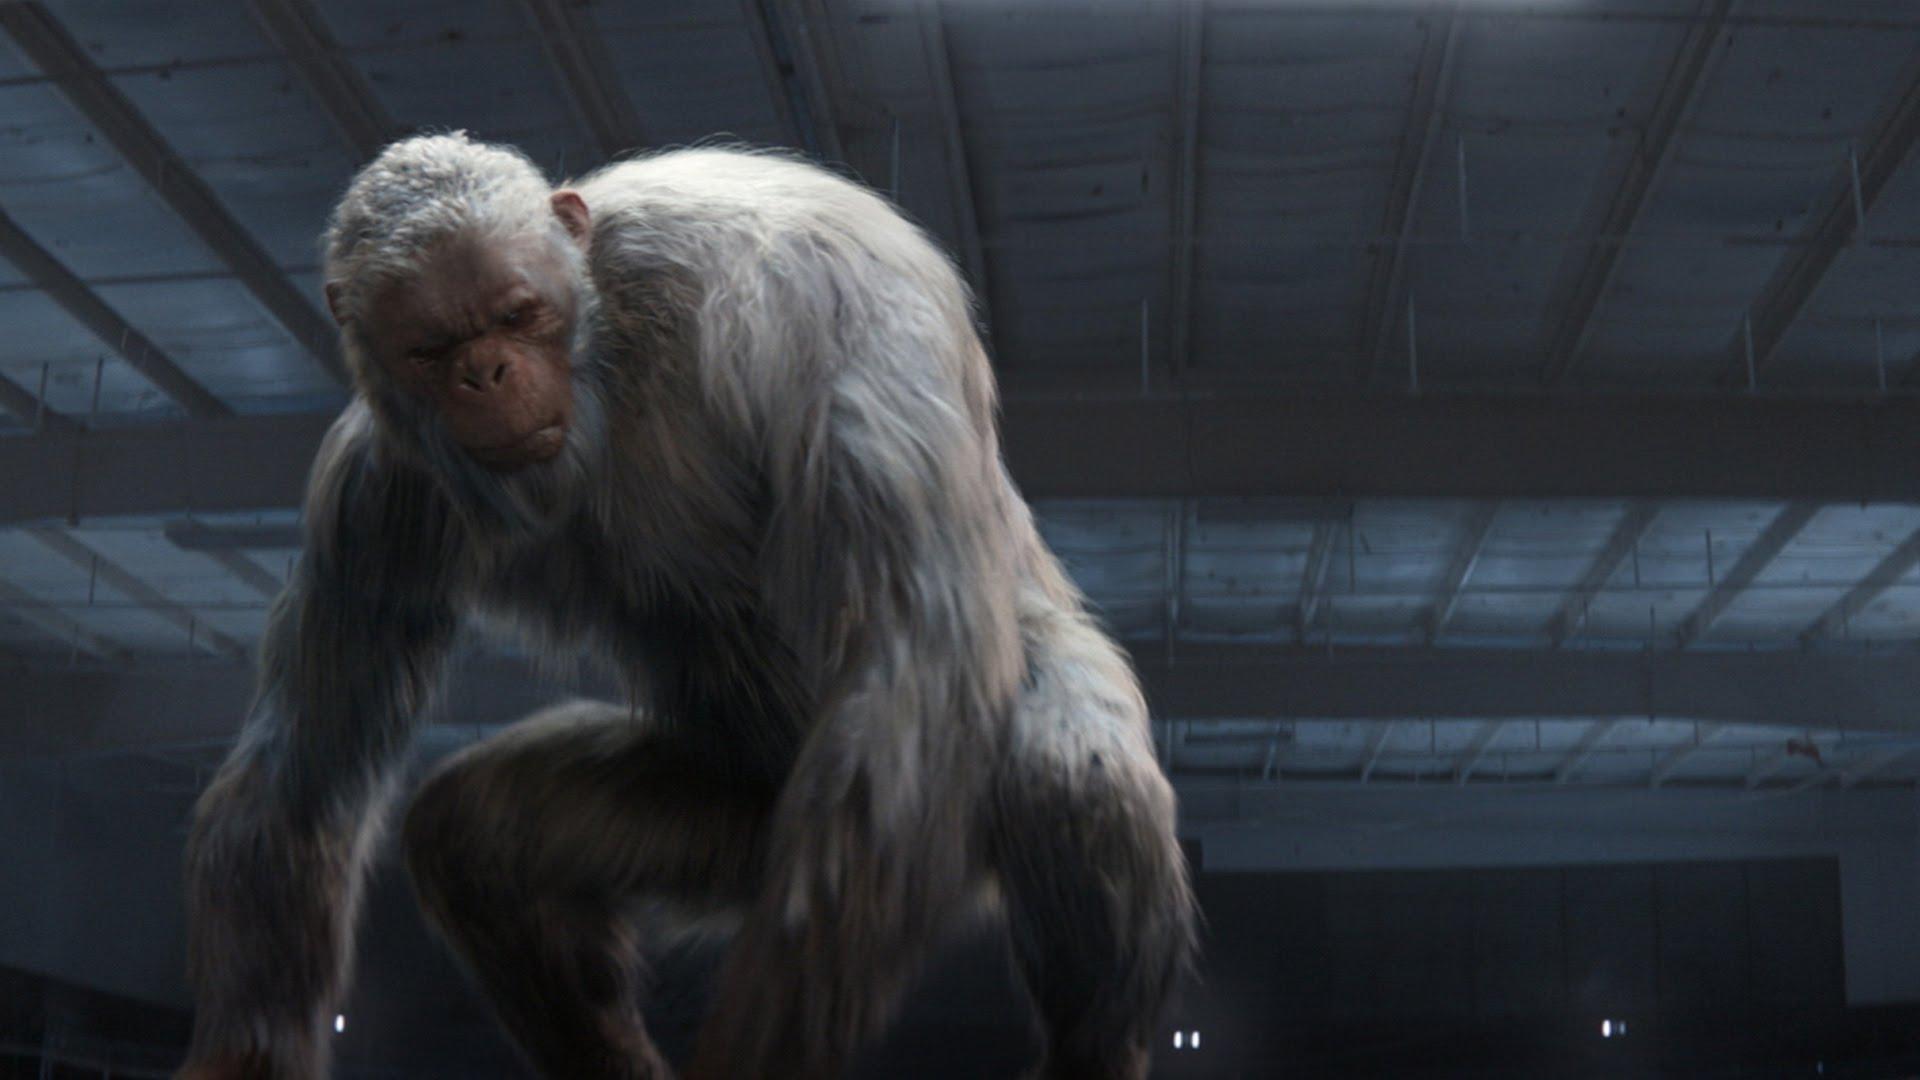 Abominable Snowman Goosebumps Monster Moviepedia Fandom